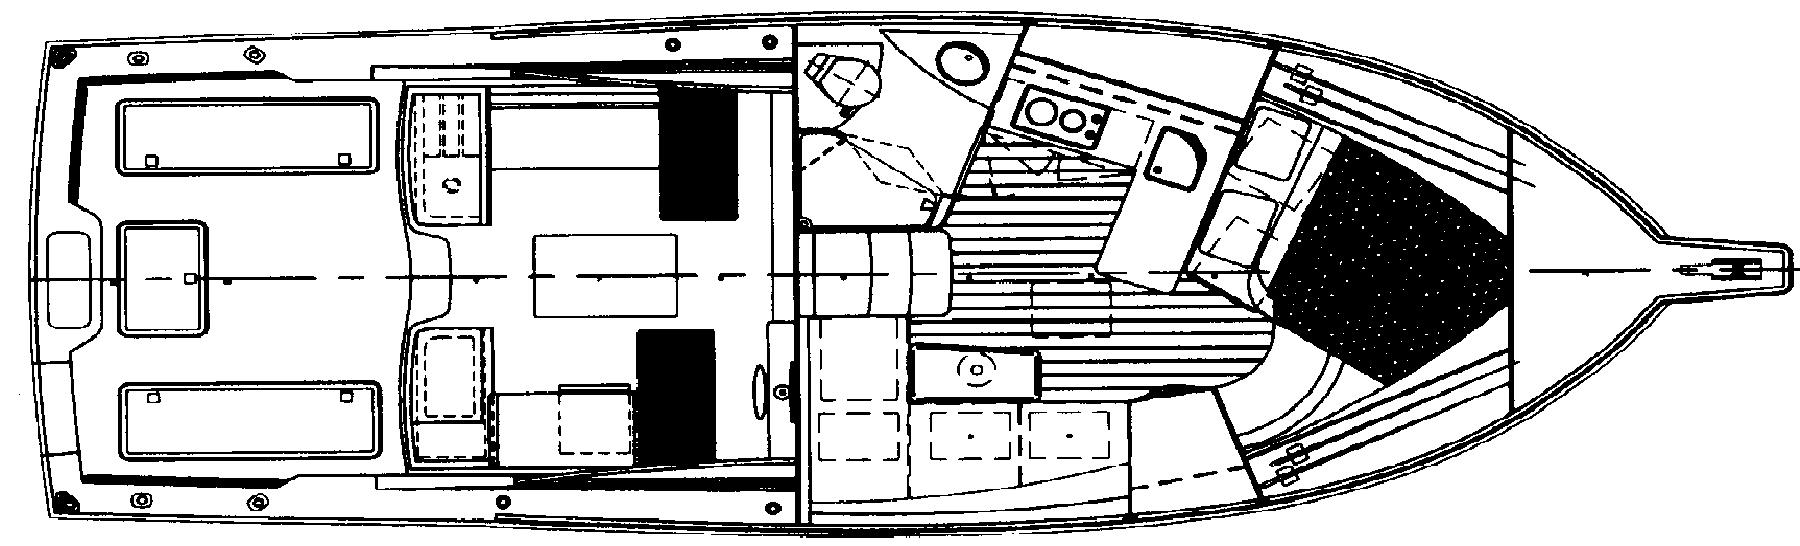 Cabo 35 Express Floor Plan 2